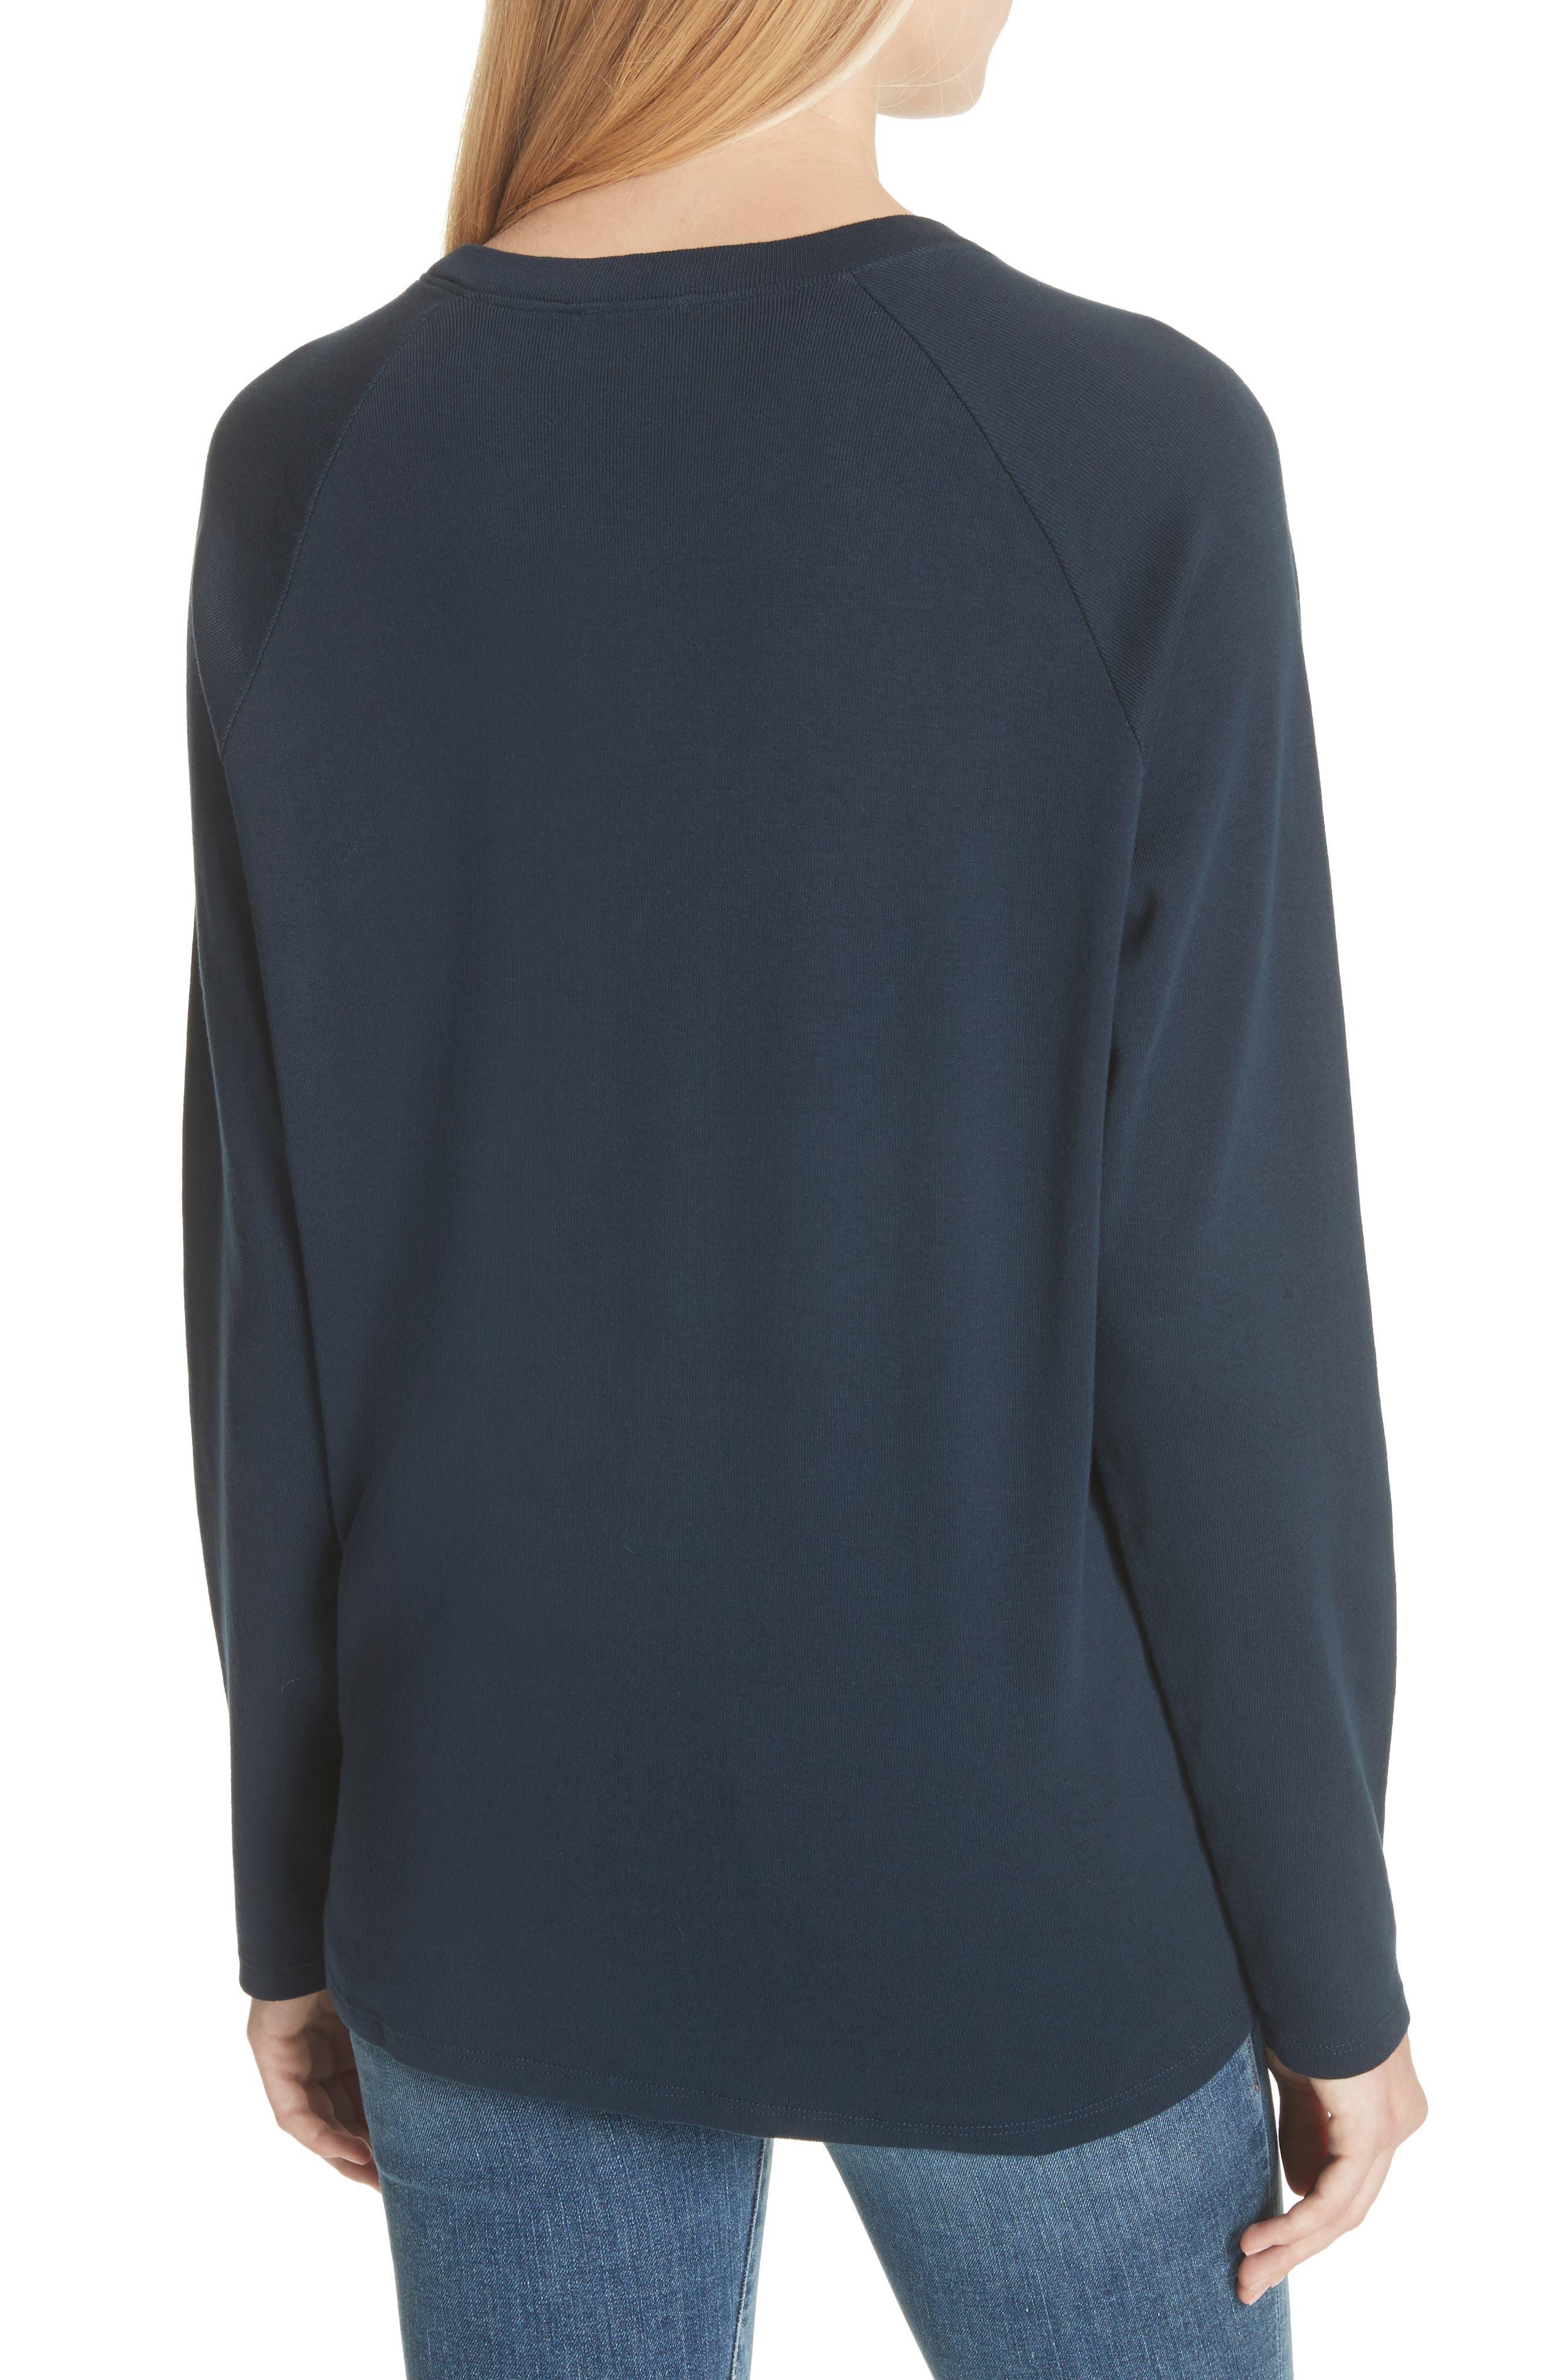 Collegiate Raglan Sweatshirt,                             Alternate thumbnail 2, color,                             Navy